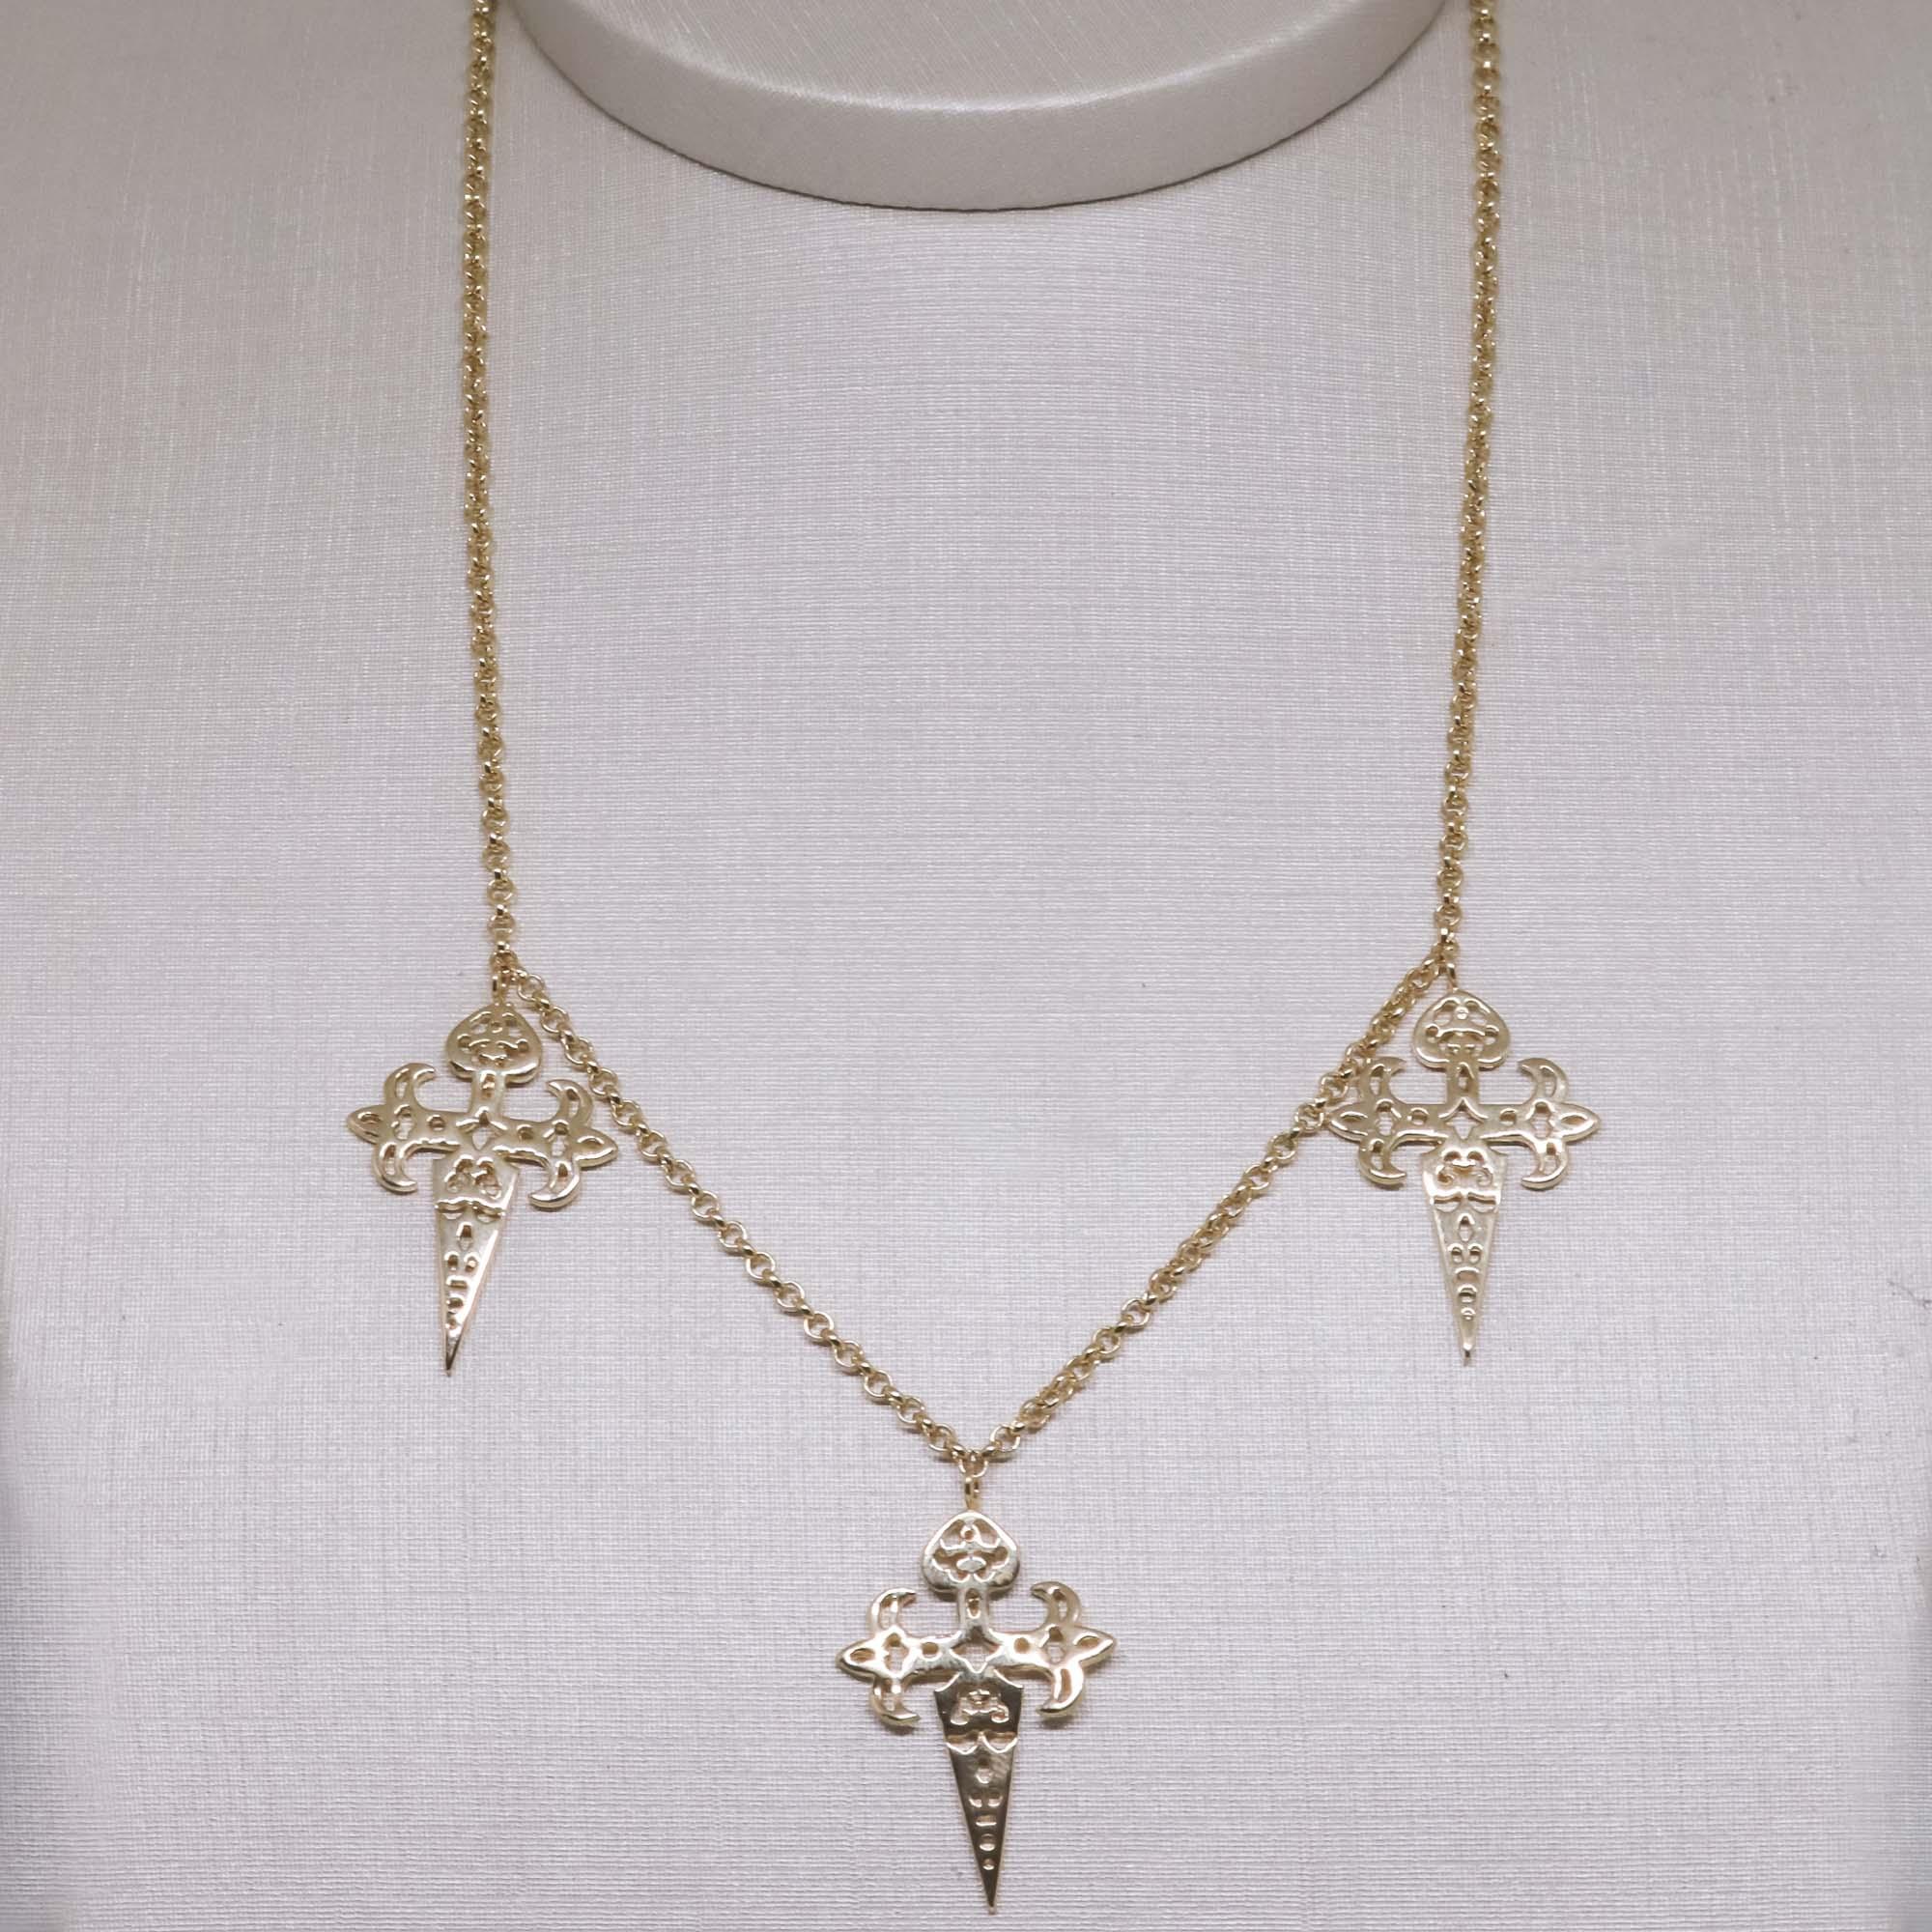 Choker  Semi joia cruz de Santiago de Compostela folheada a ouro 18k ou rhodium